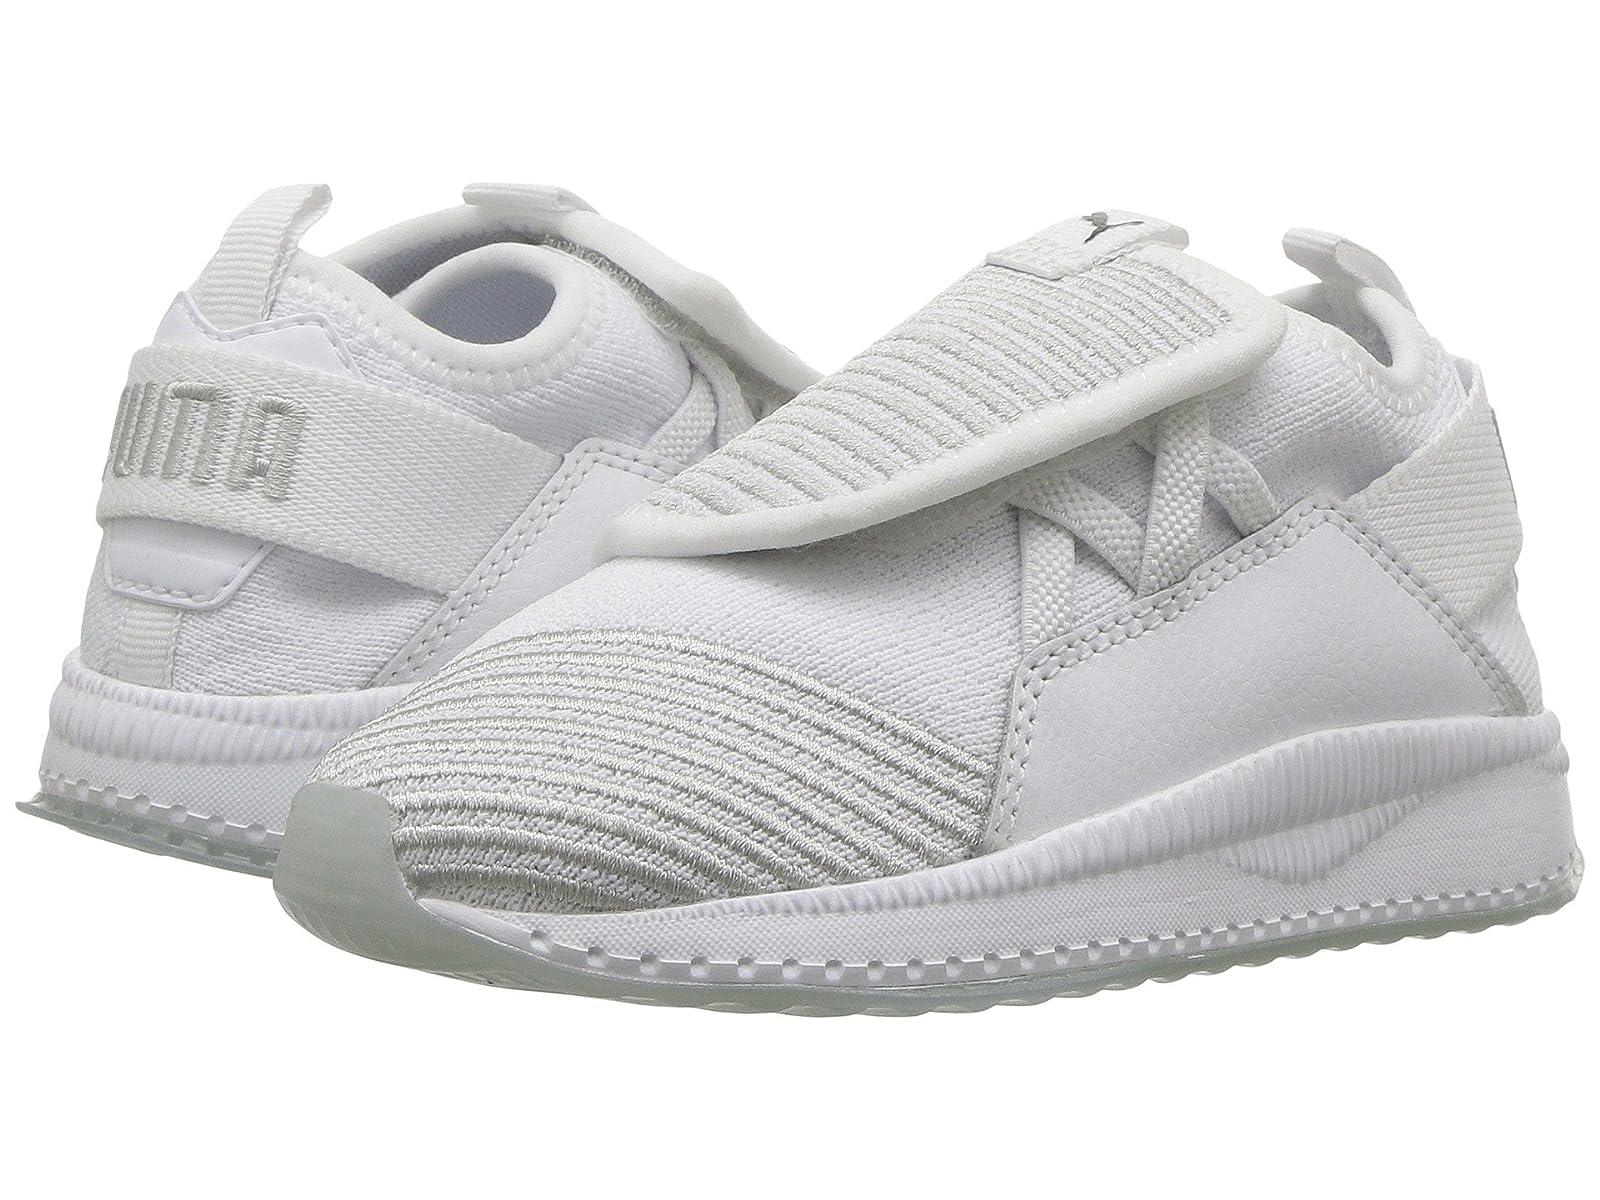 Puma Kids Tsugi Jun V (Toddler)Cheap and distinctive eye-catching shoes